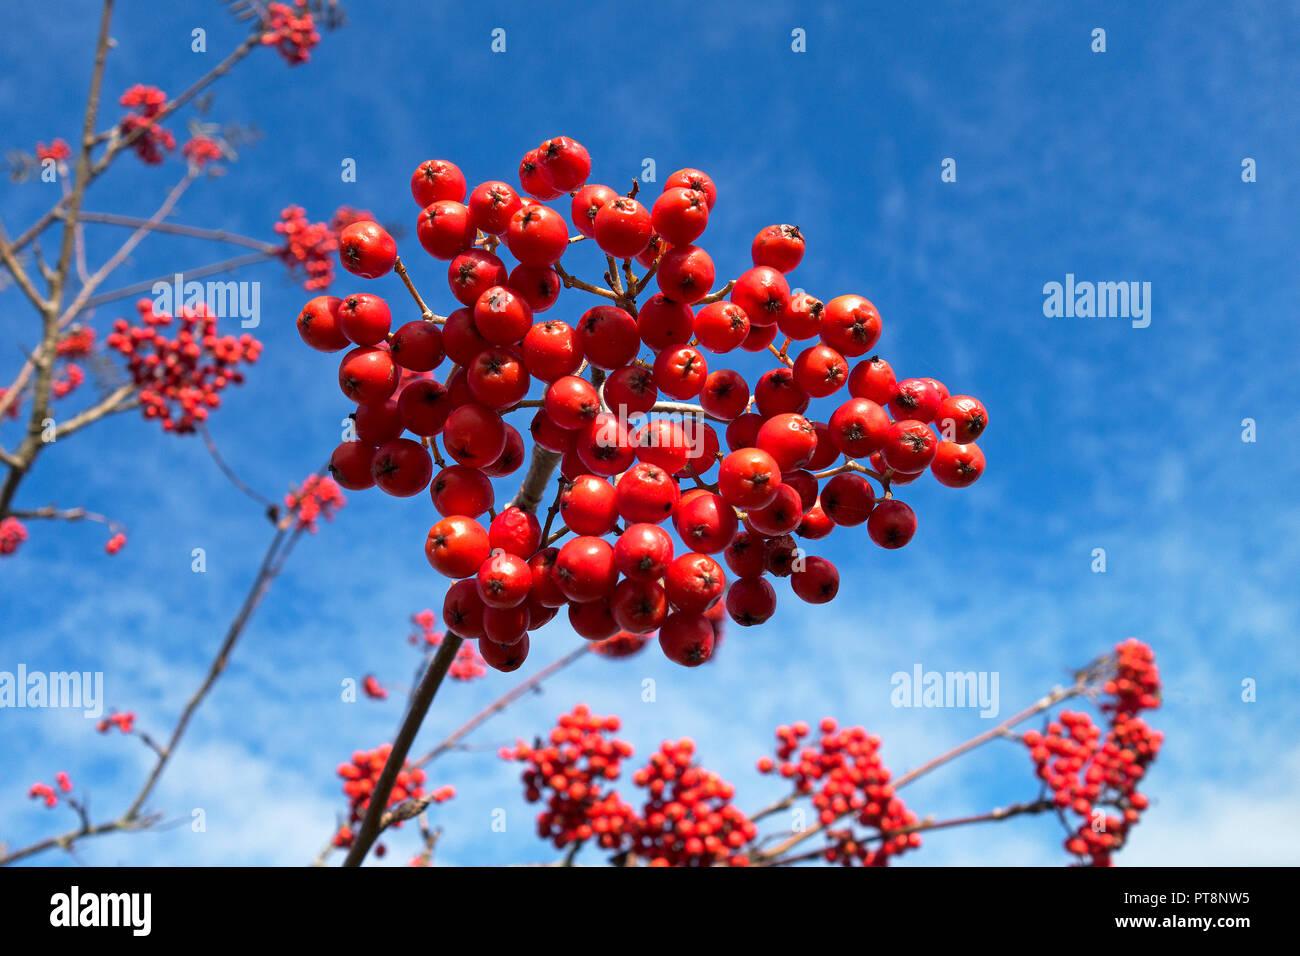 rowan berries on mountain ash, rowan tree, against blue sky. Stock Photo